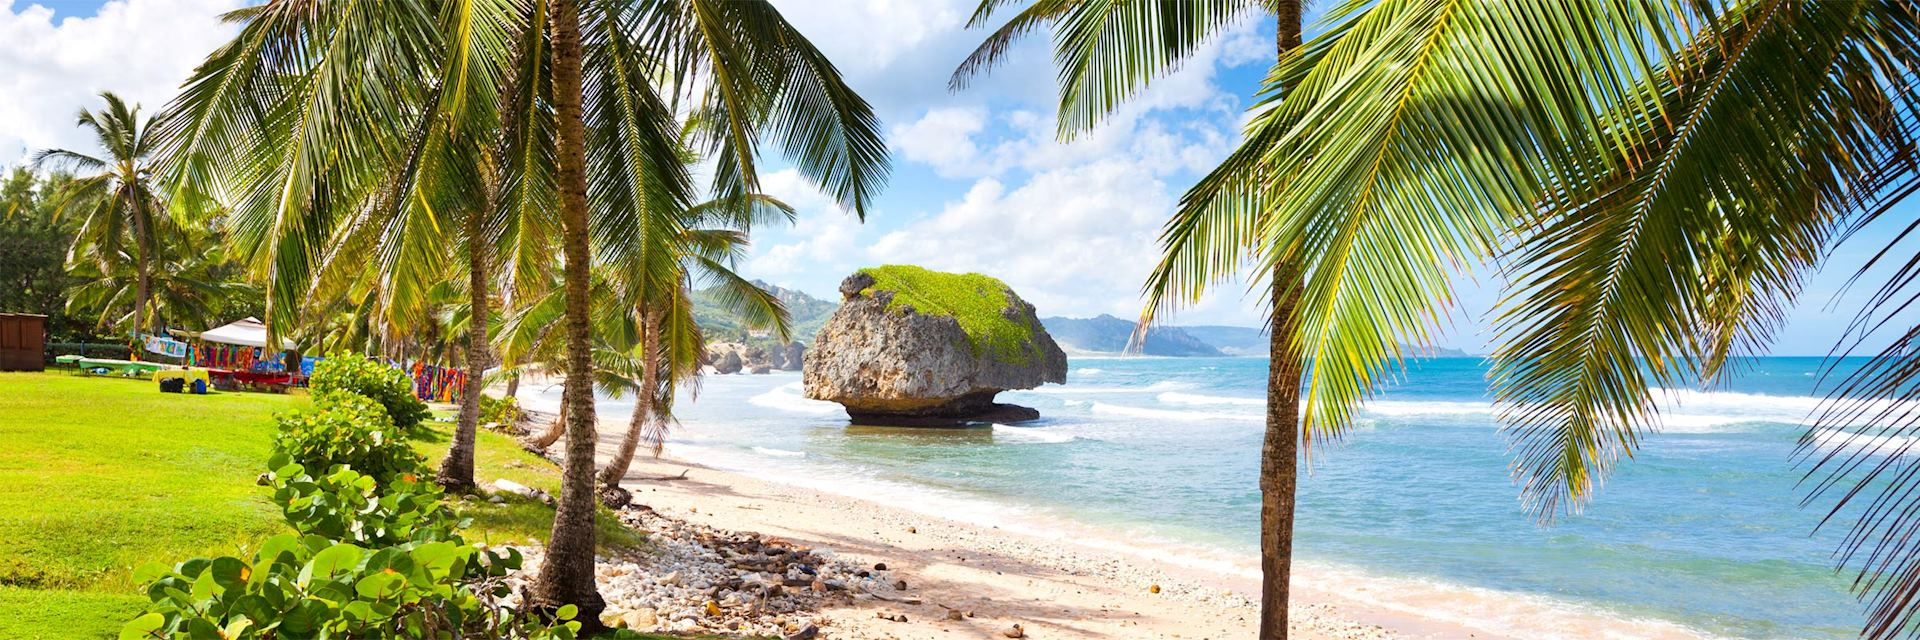 Barthsheba on the east coast of Barbados